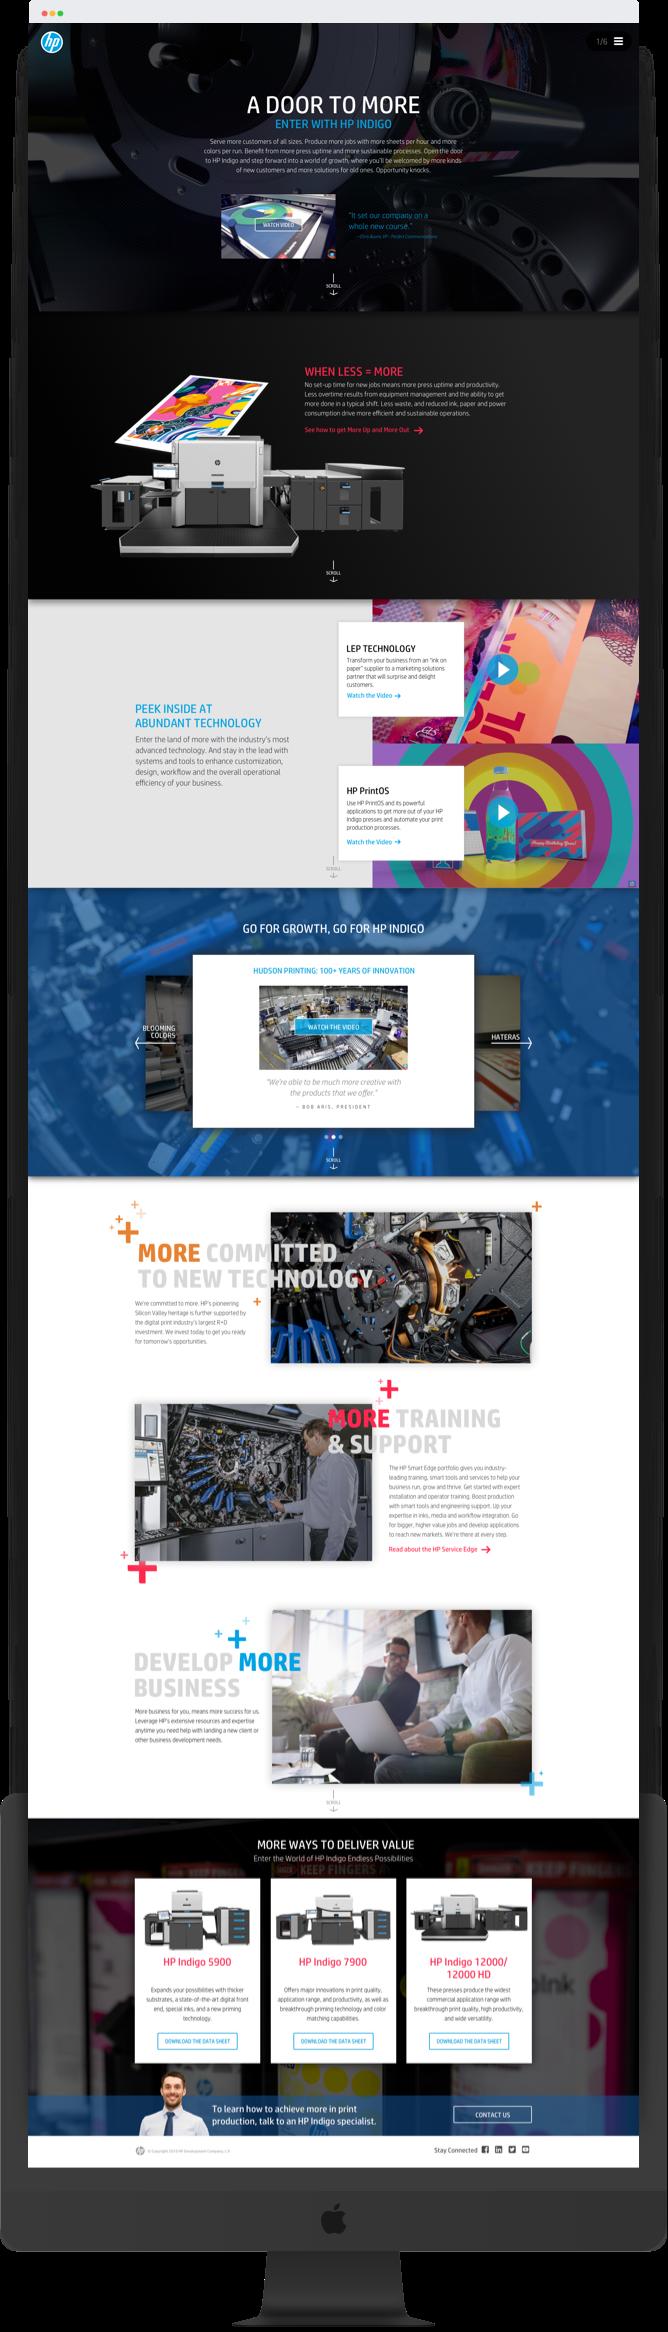 HP Indigo Printers Campaign